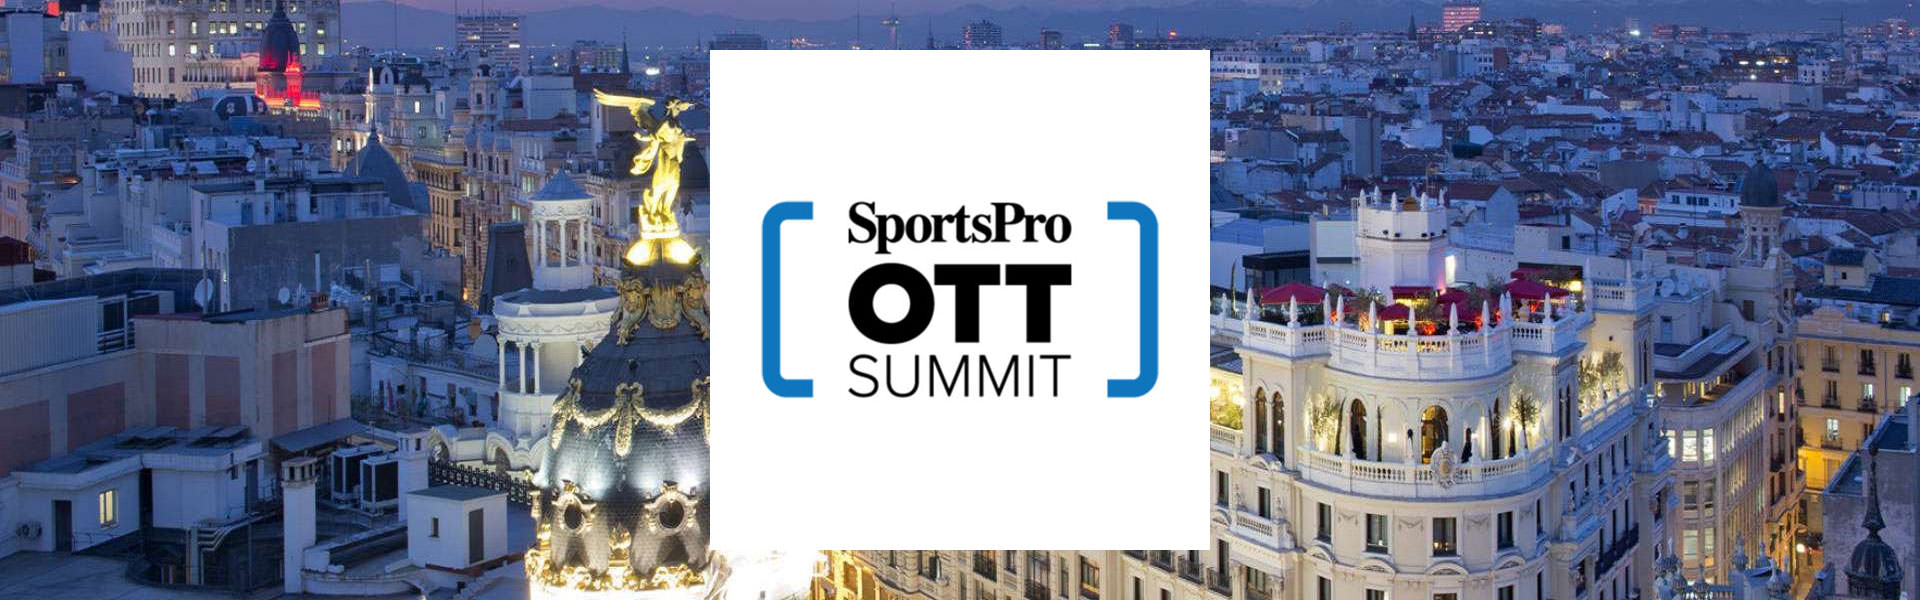 SportsPro OTT Summit event logo